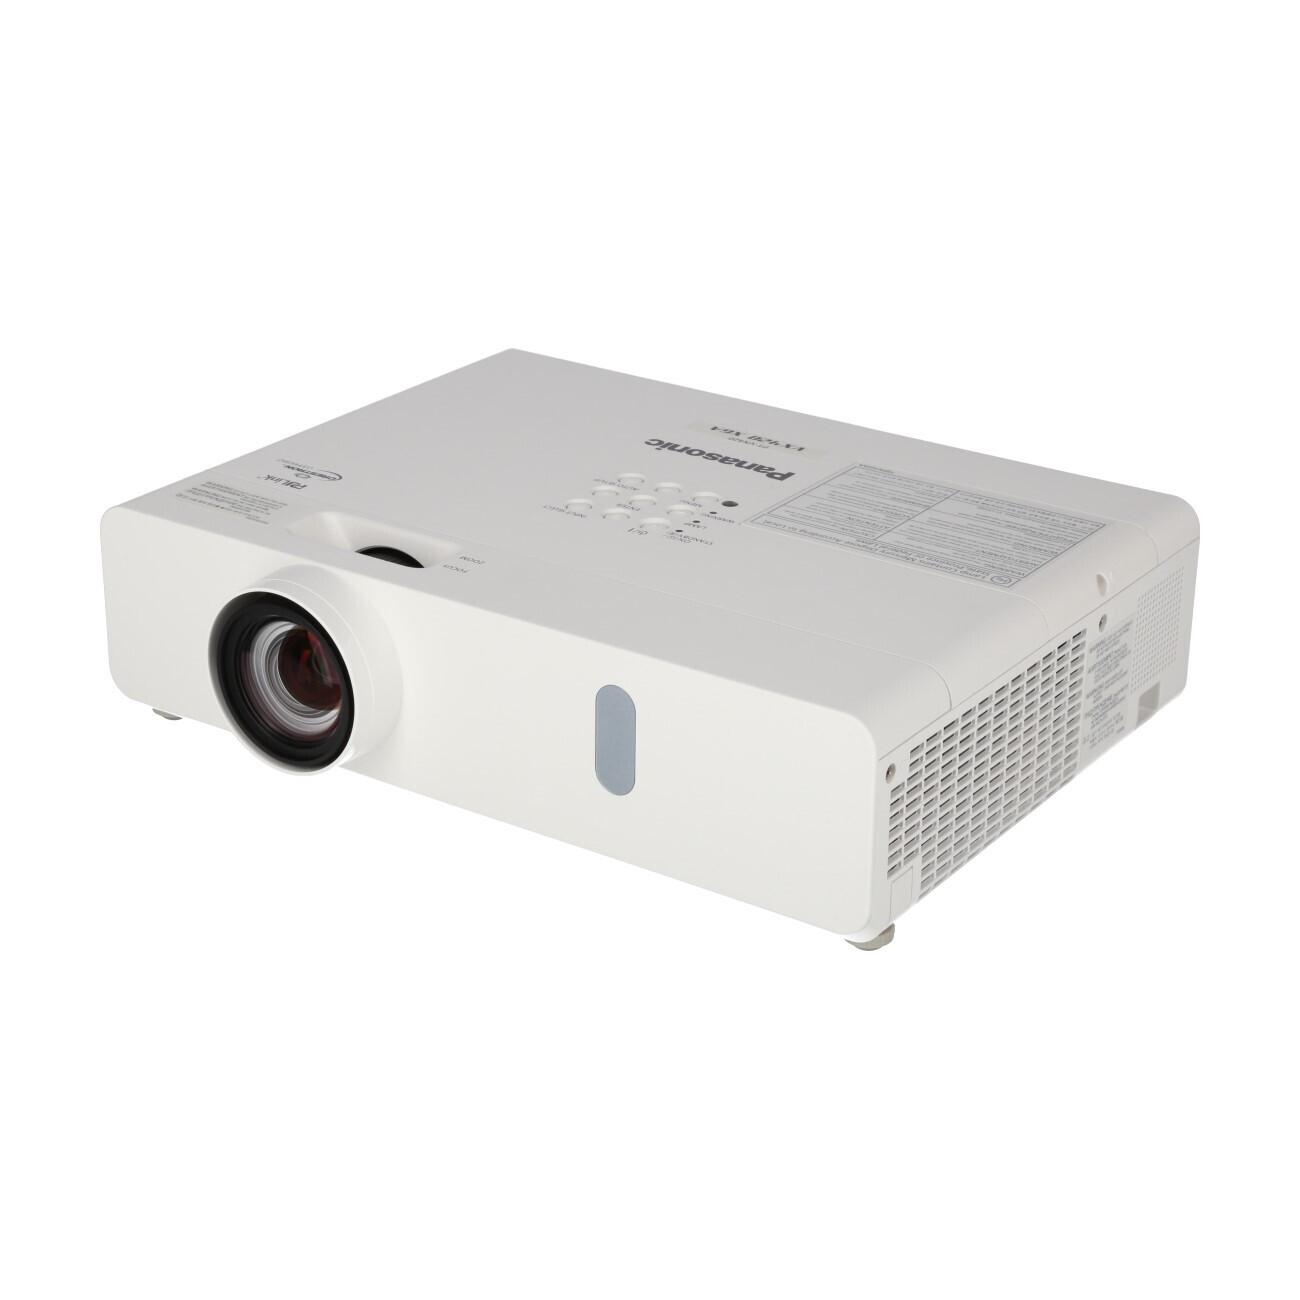 Panasonic PT-VX420E Beamer mit 4500 ANSI-Lumen und XGA Auflösung